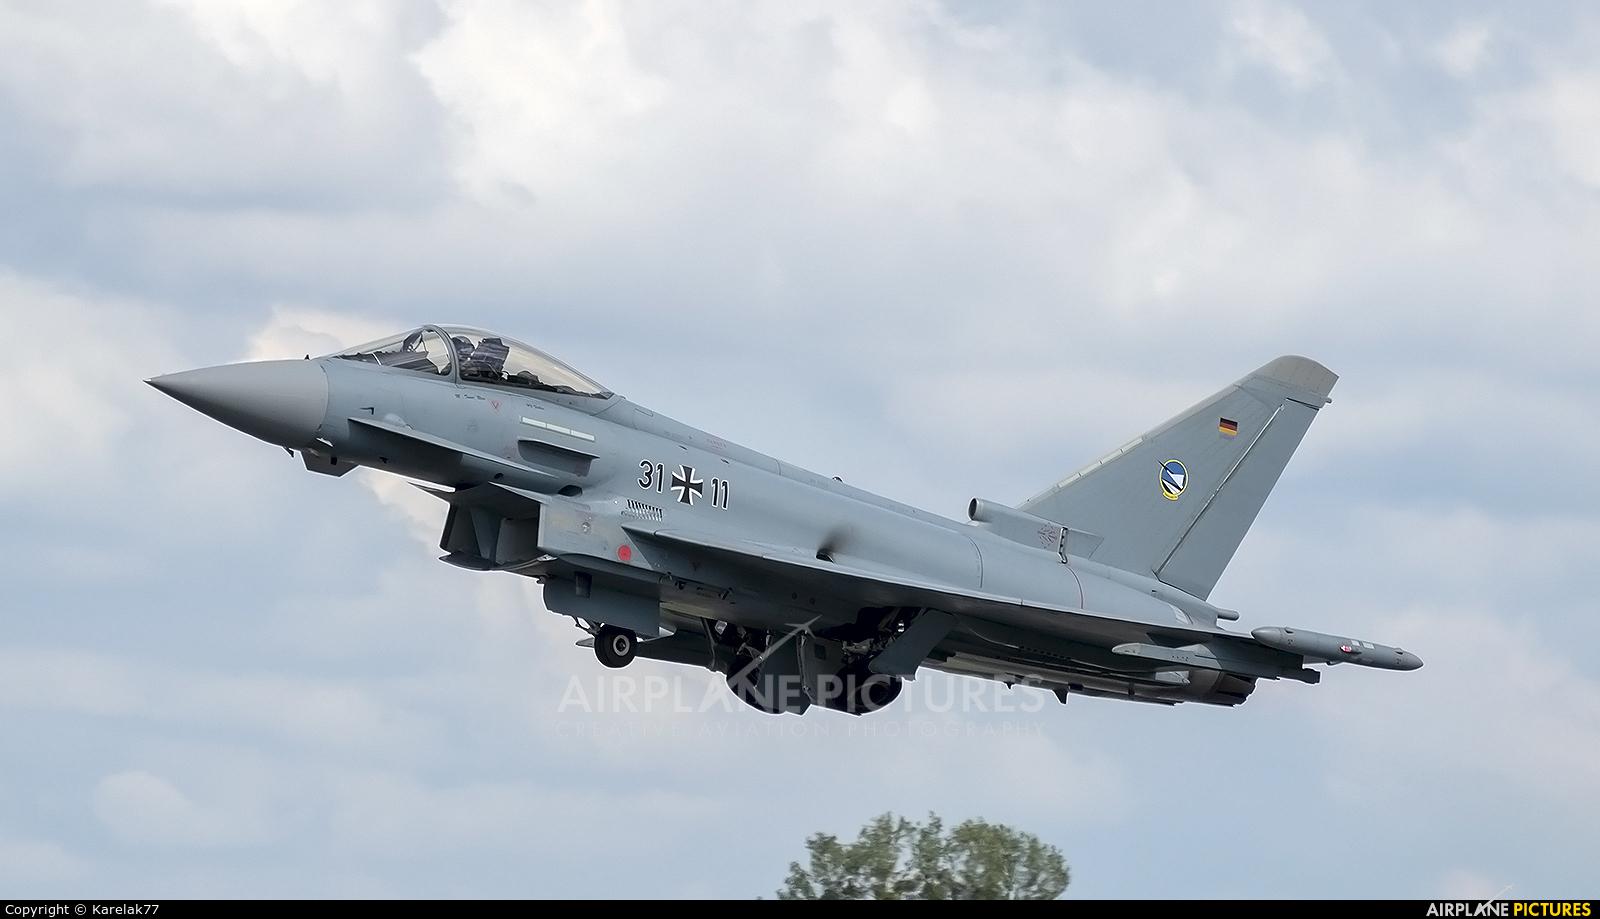 Germany - Air Force 31+11 aircraft at Radom - Sadków